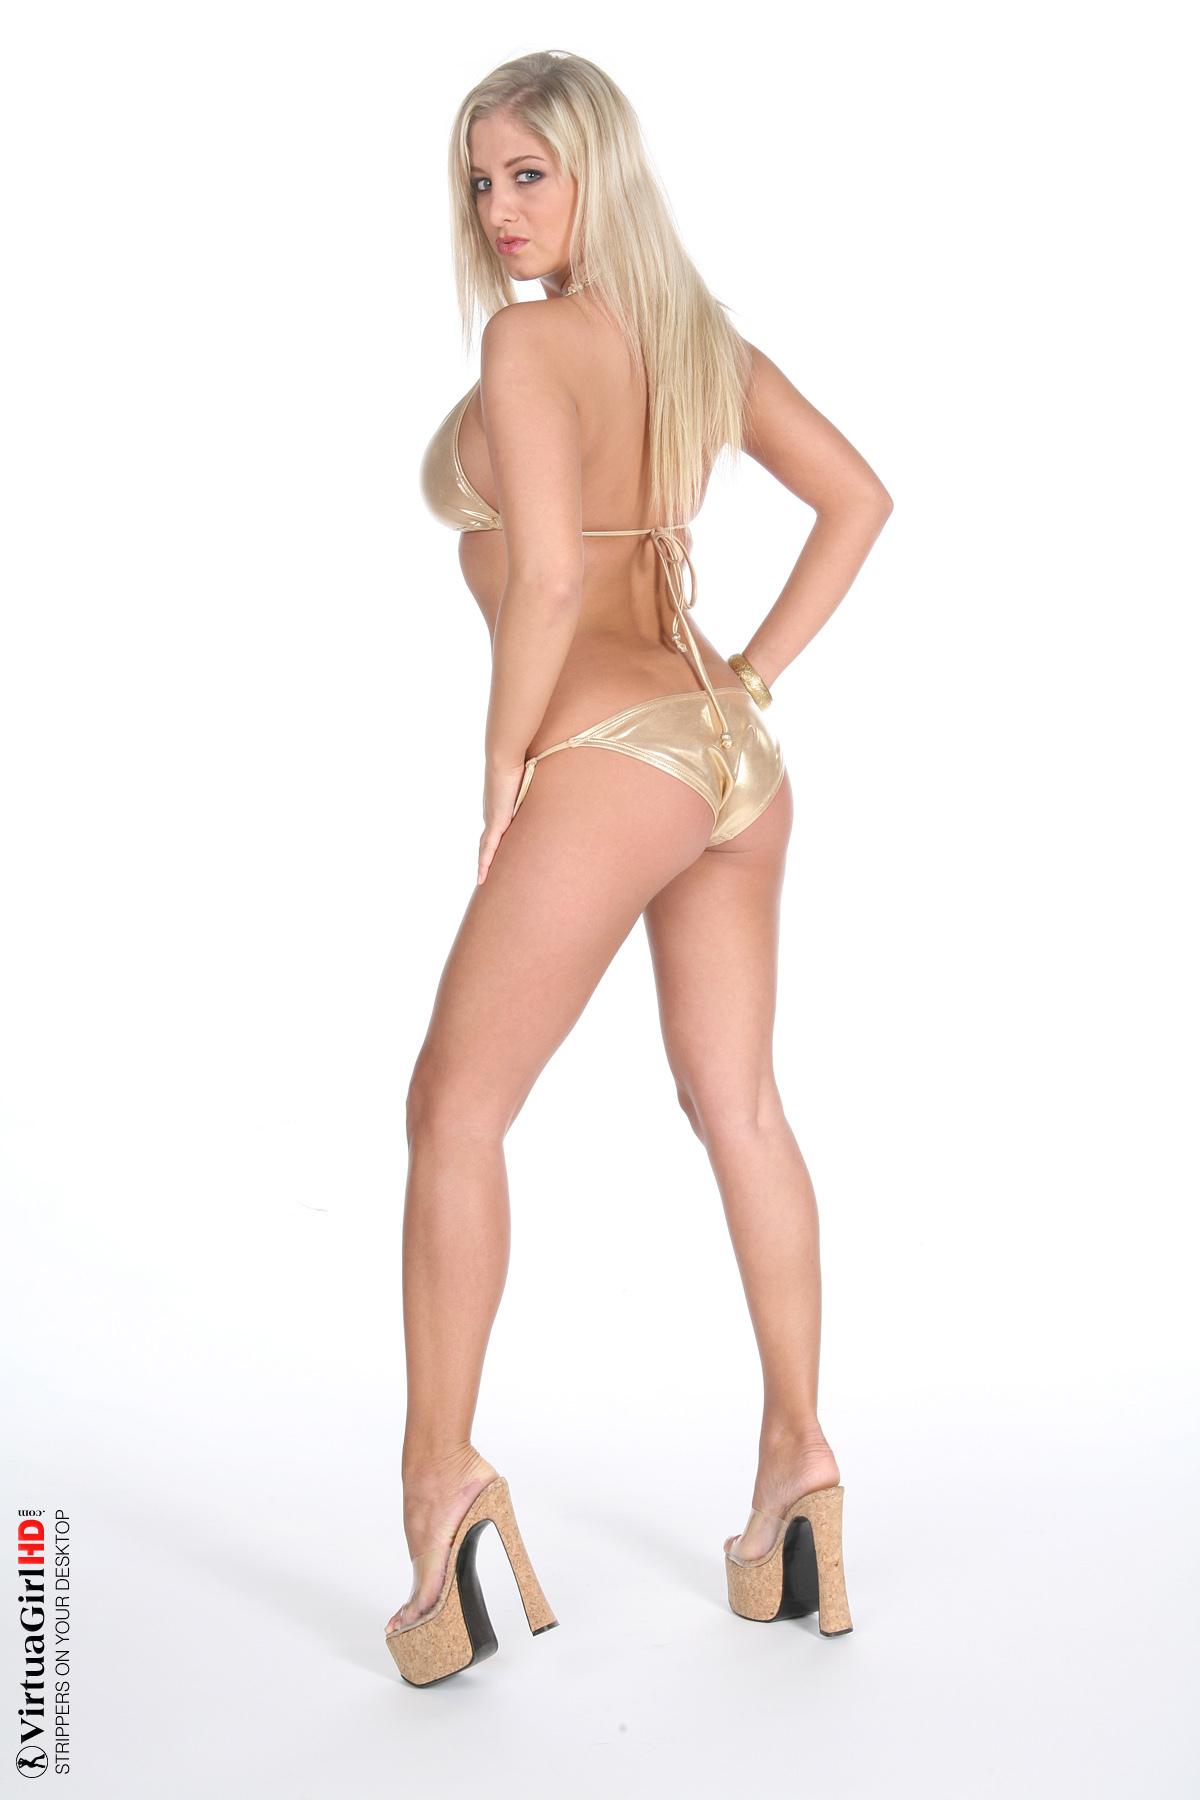 topless babes wallpaper